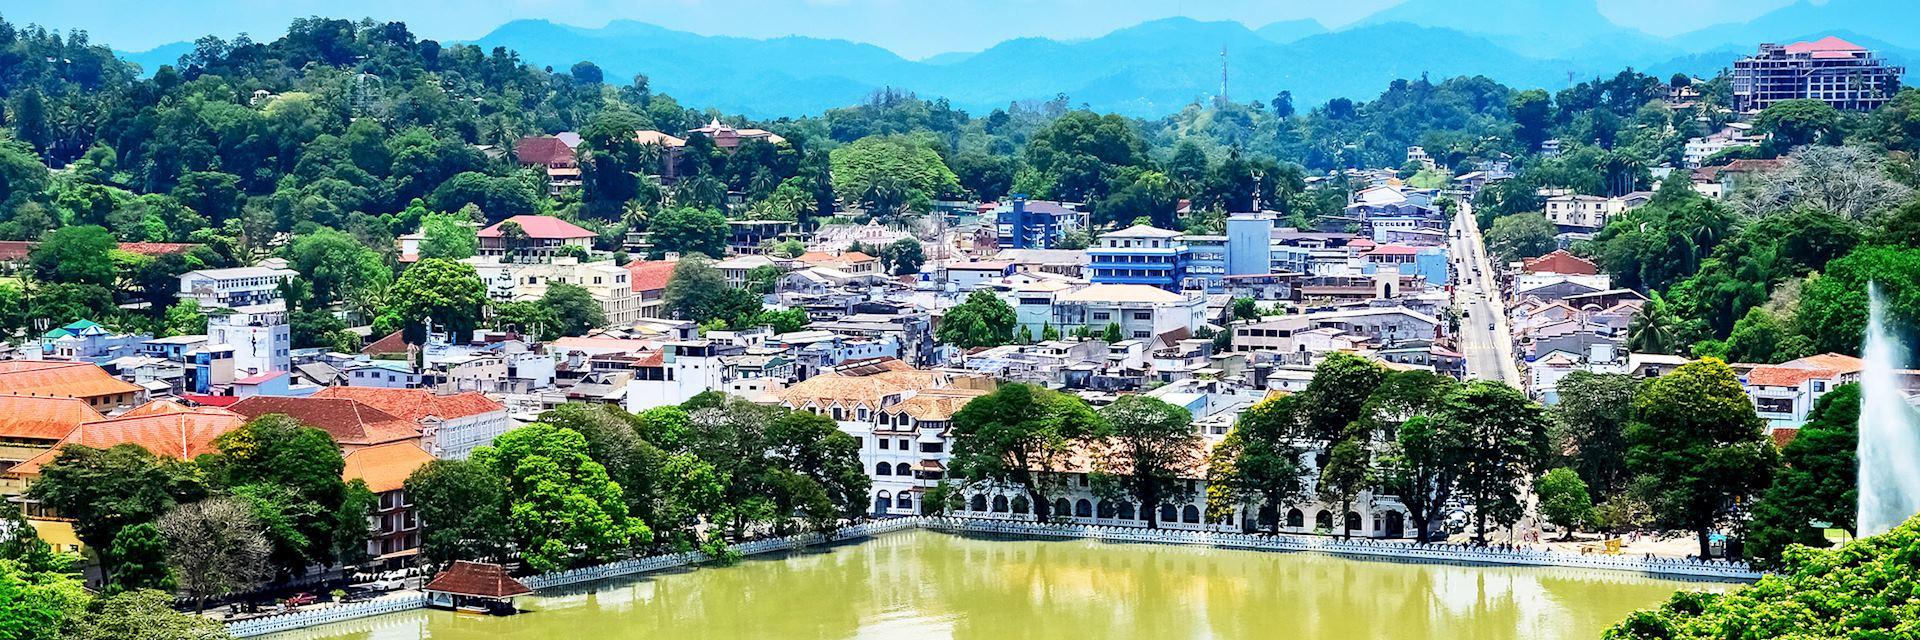 Kandy skyline, Sri Lanka